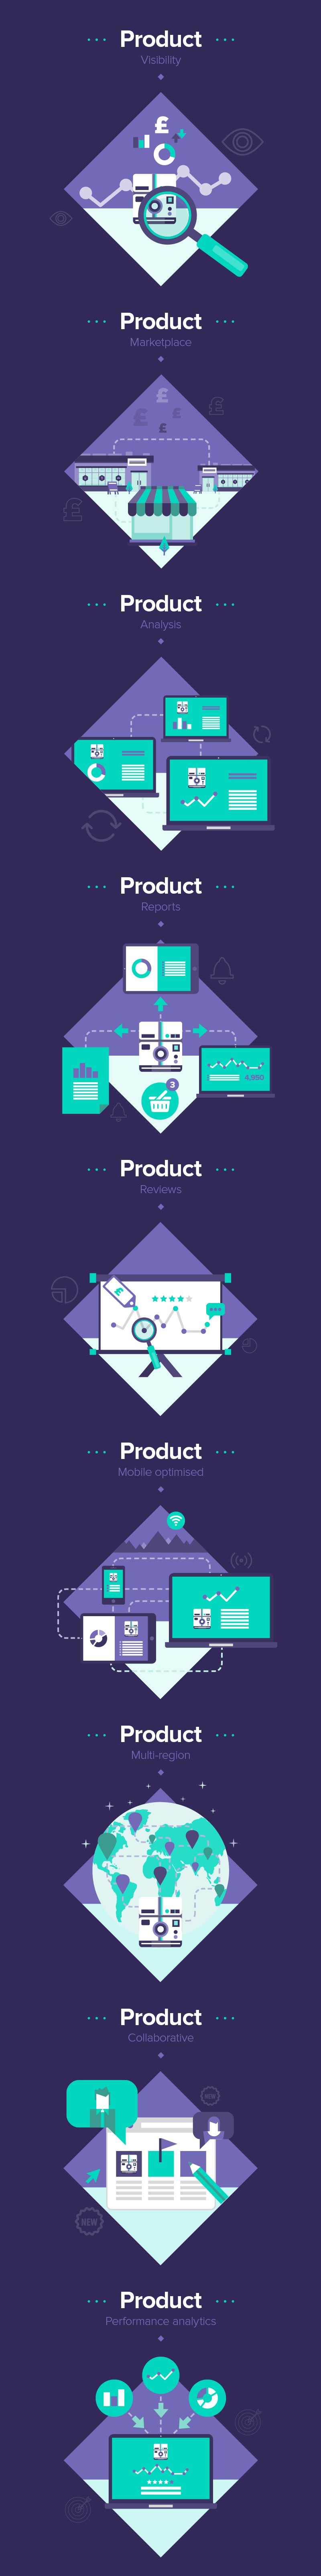 Application Of Illustrations For A New Brand Retailvision Development Of Product Descriptions For Both Web Email Design Inspiration Web App Design App Design